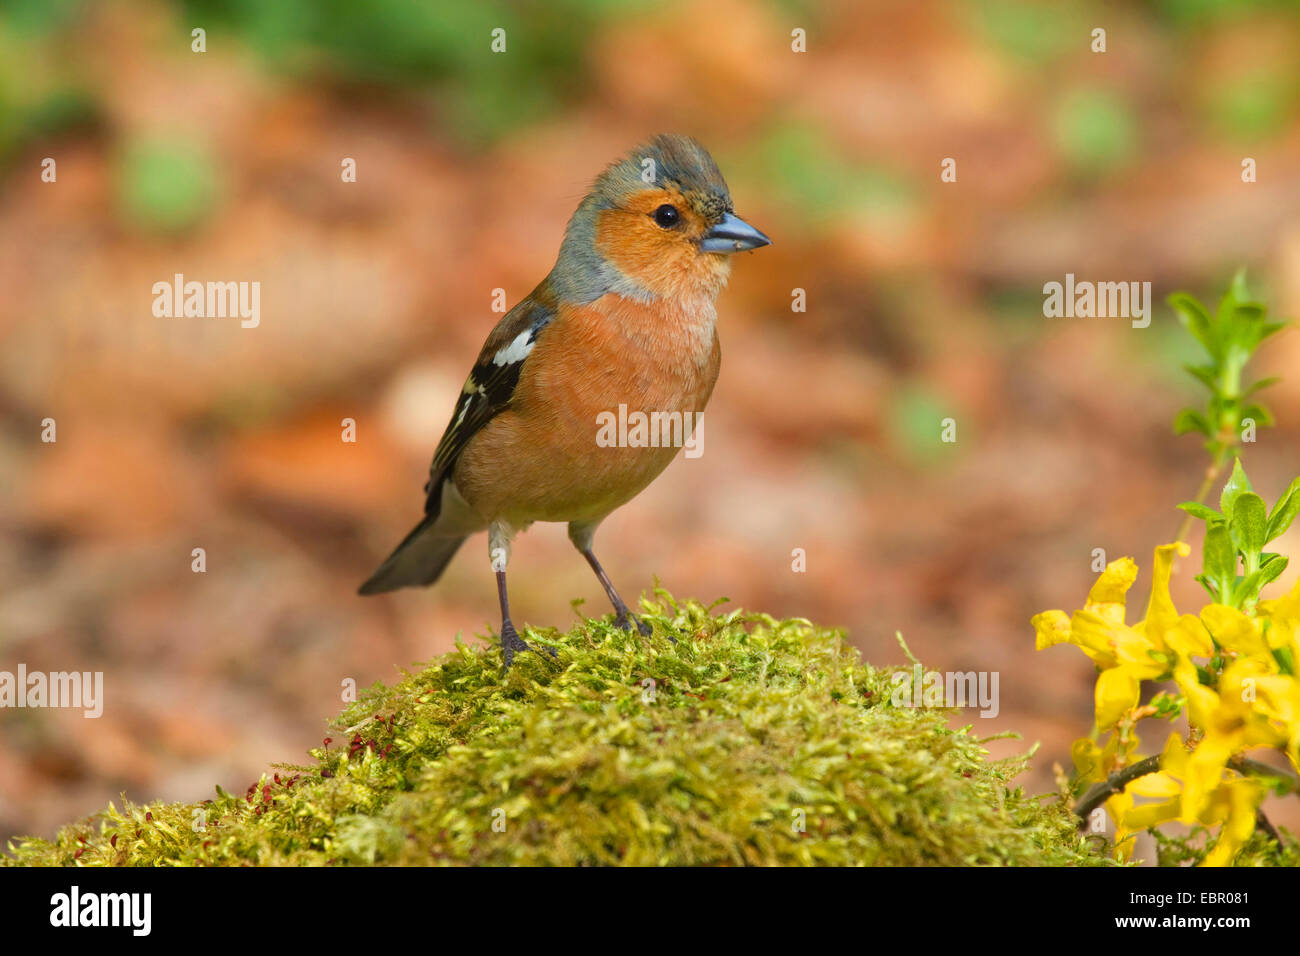 chaffinch (Fringilla coelebs), male, Germany, North Rhine-Westphalia - Stock Image